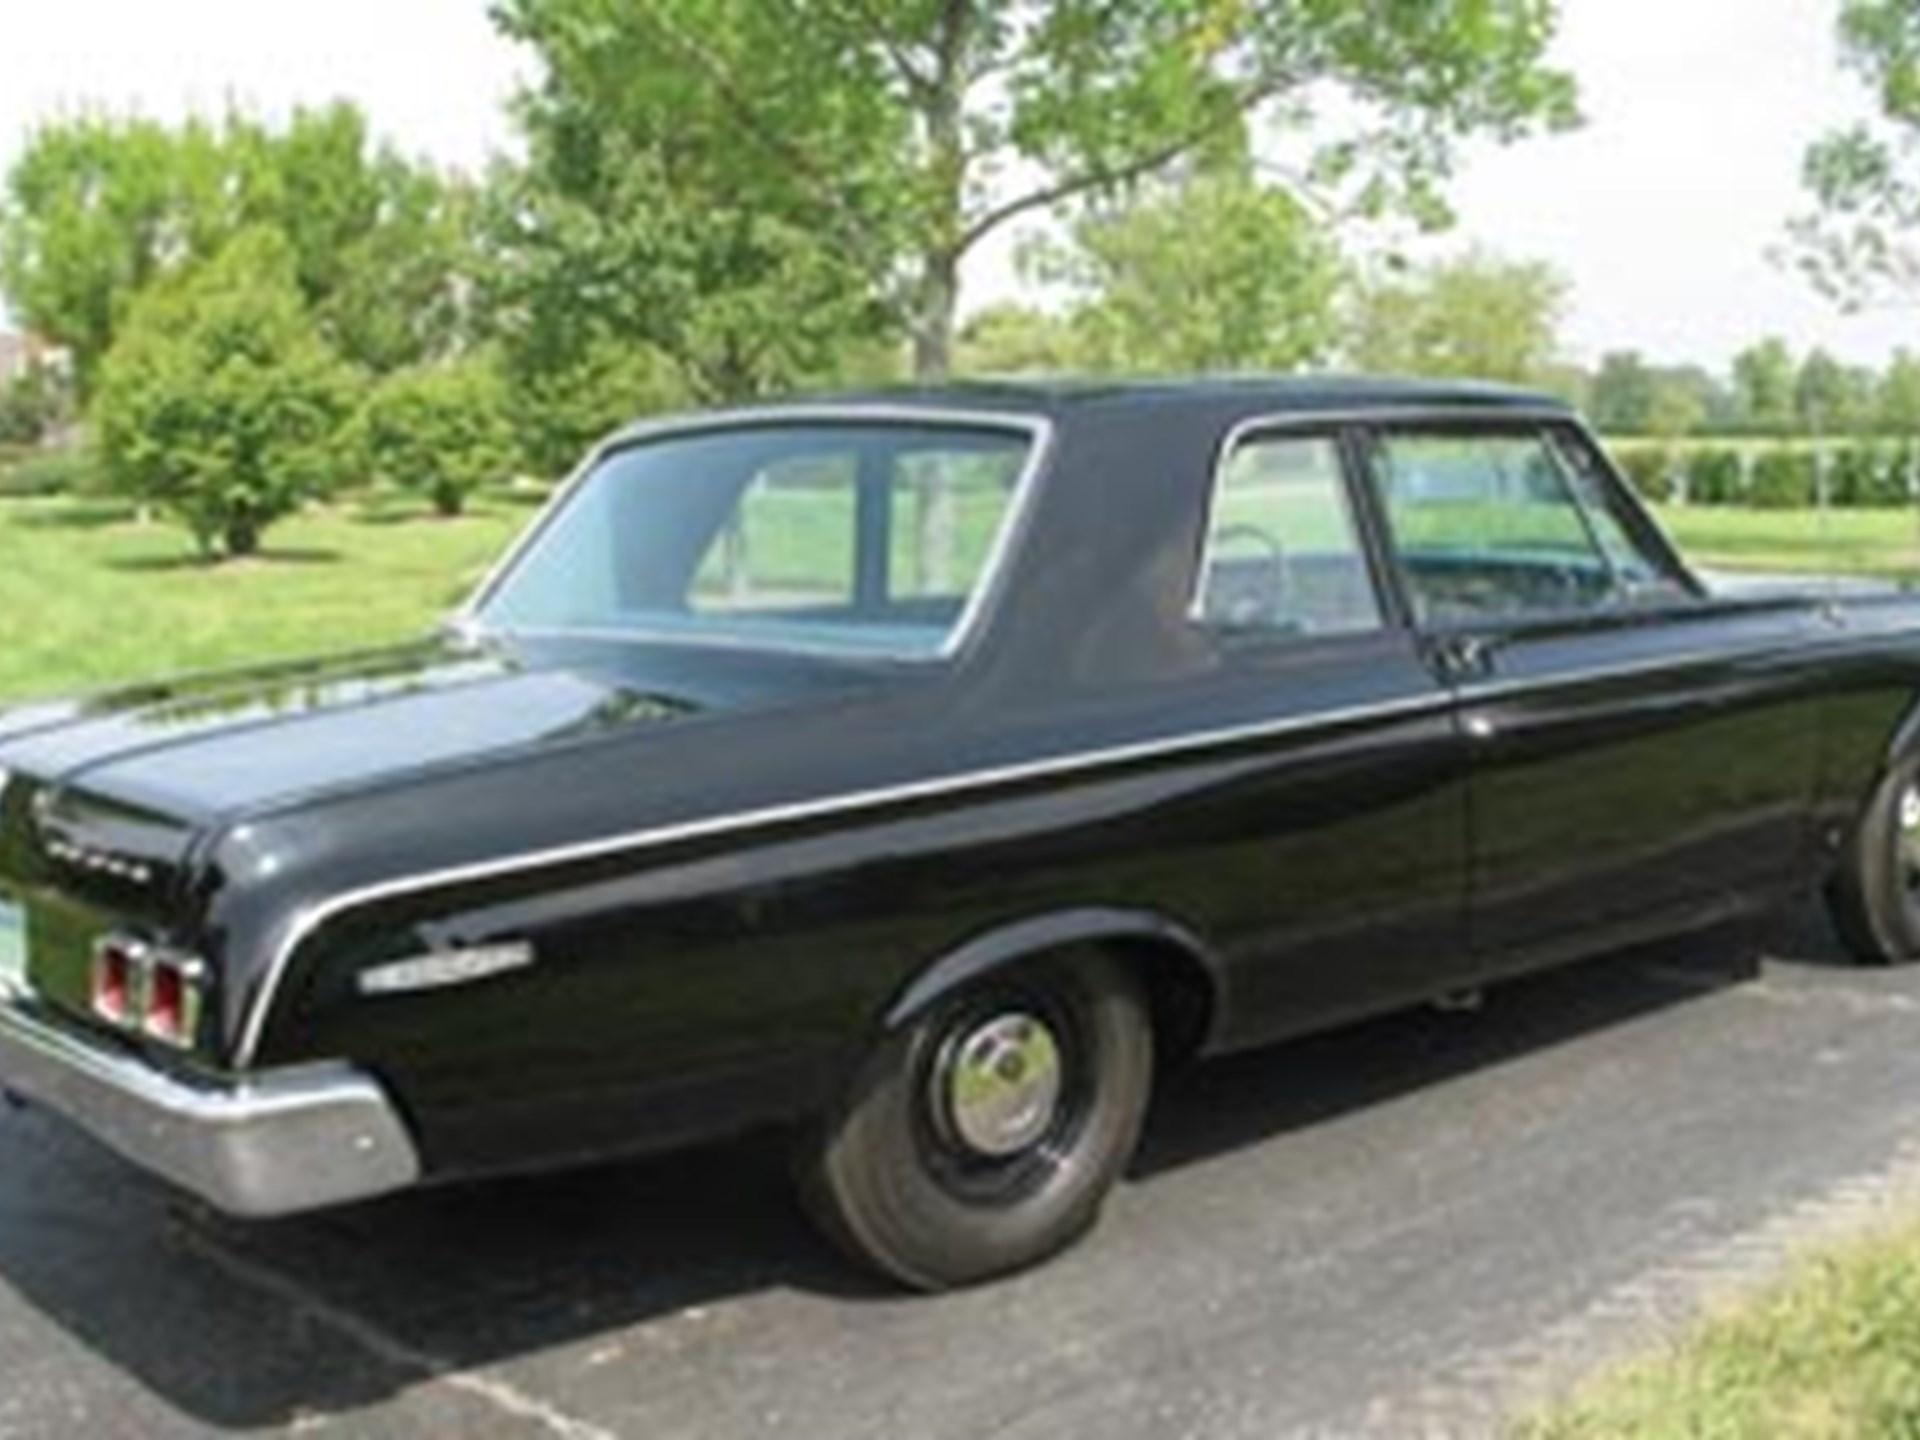 Rm Sothebys 1964 Dodge Polaris 426 Max Wedge Sedan The Florida